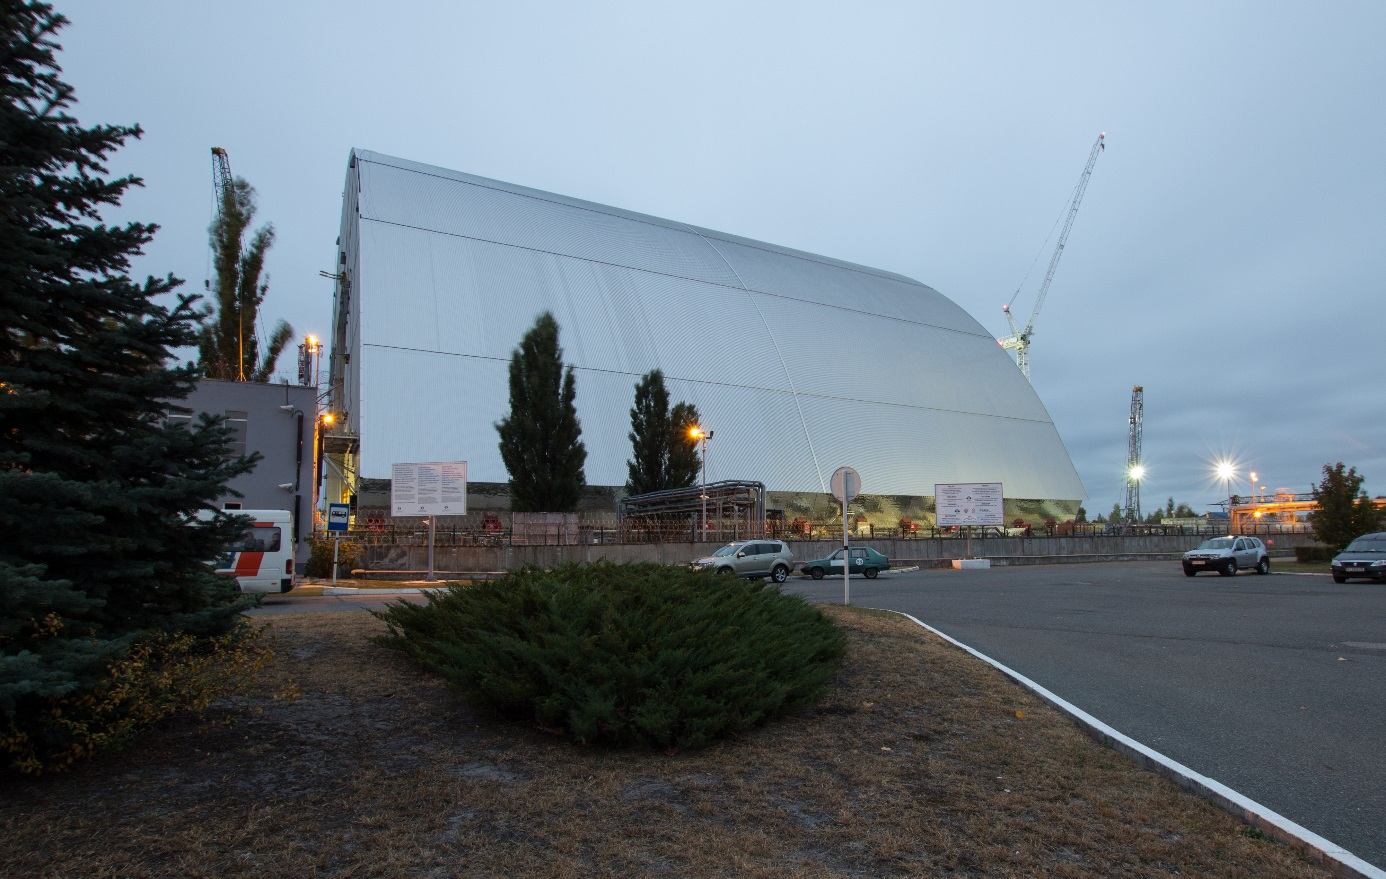 V říjnou 2016 se nový sarkofág se nasunul nad zničený čtvrtý černobylský blok (zdroj Tim Porter, wikipedie).